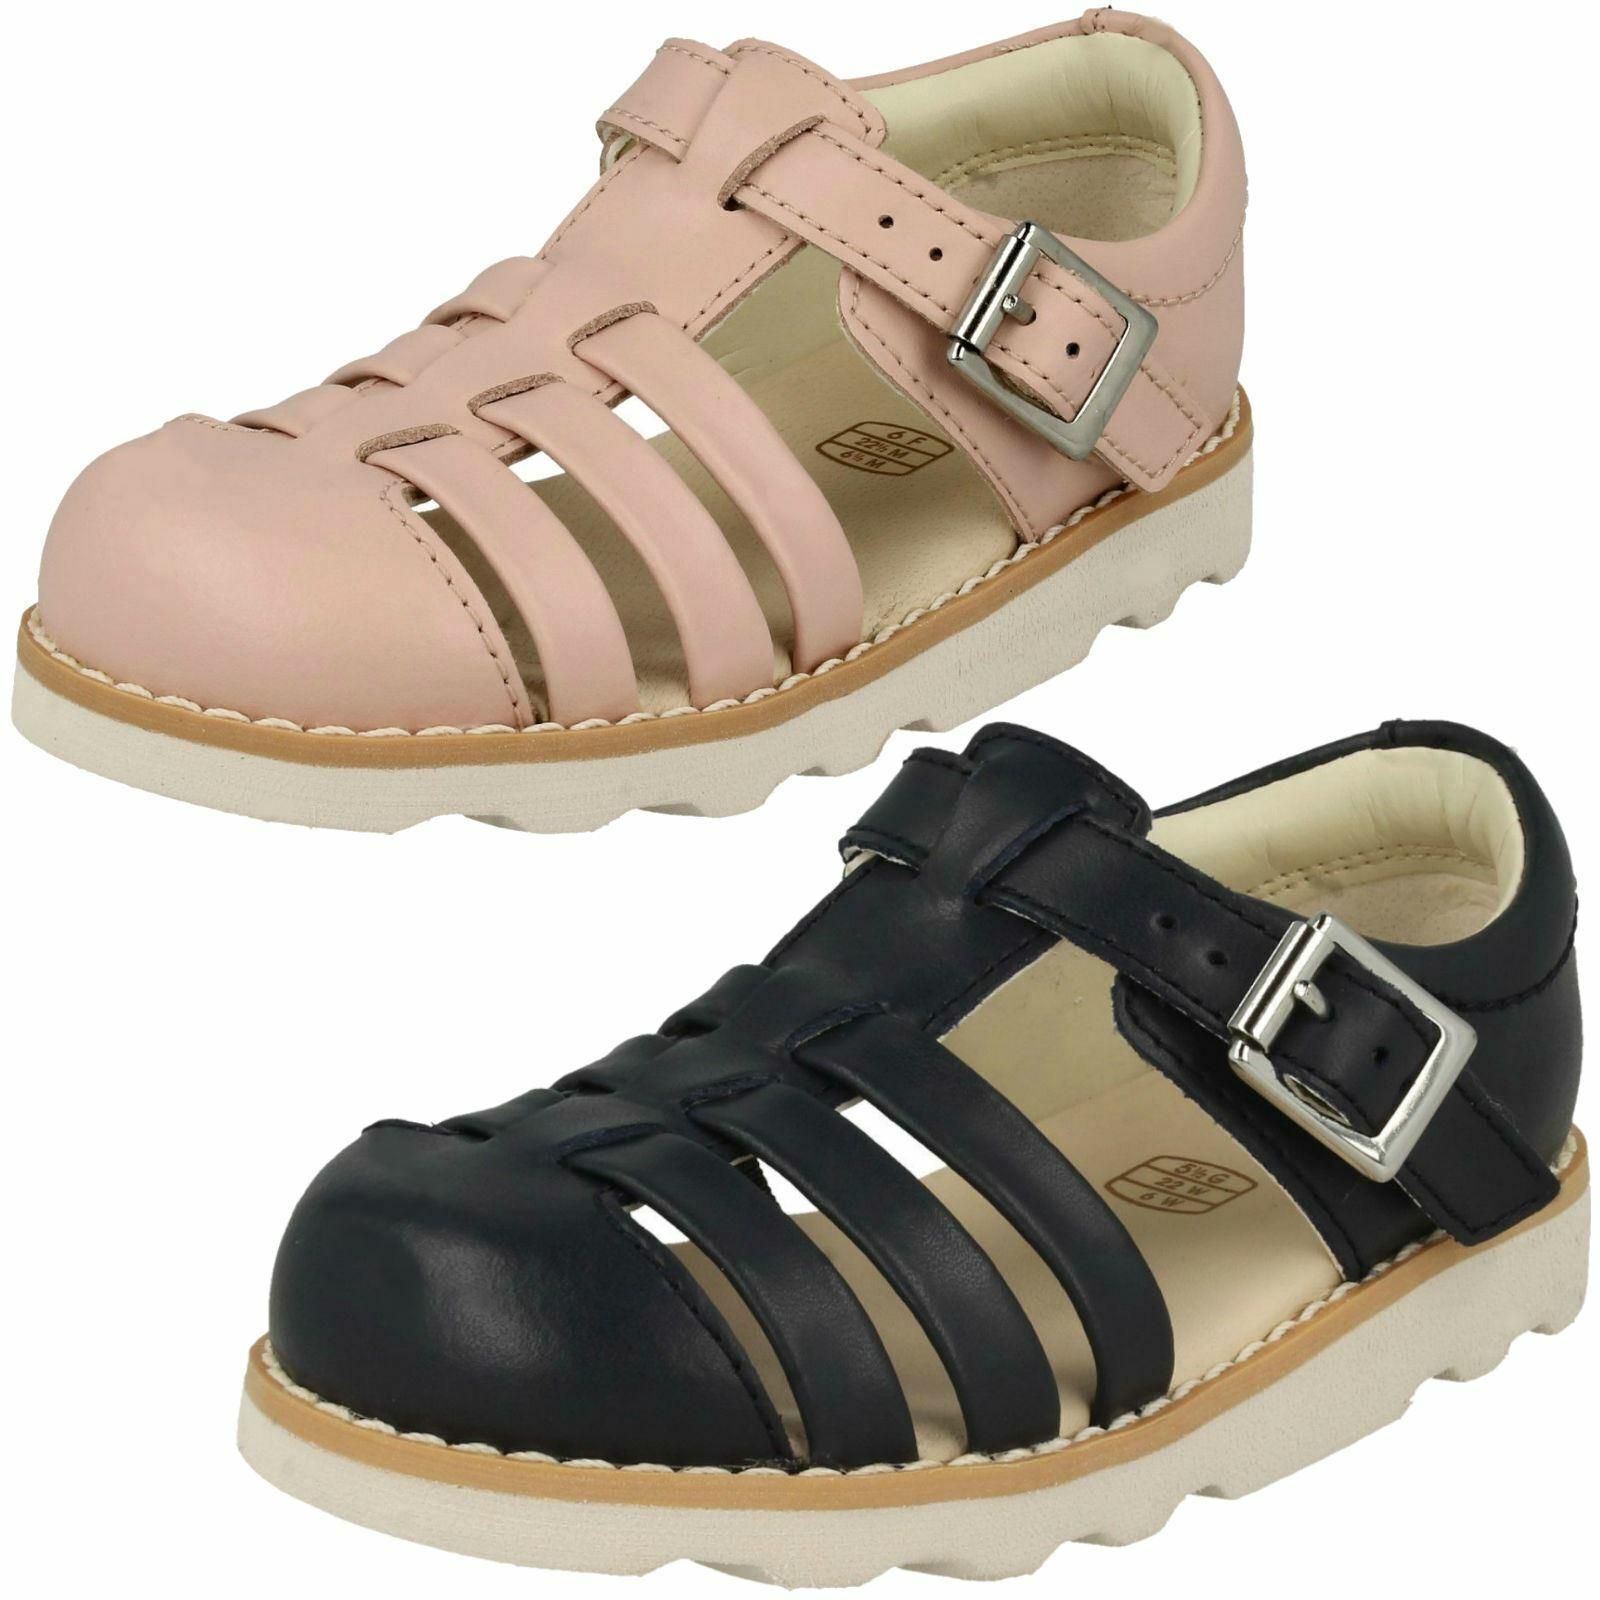 Girls Clarks Raspberry Pink Water Friendly Closed Toe Sandals UK 6-9.5 F NEW